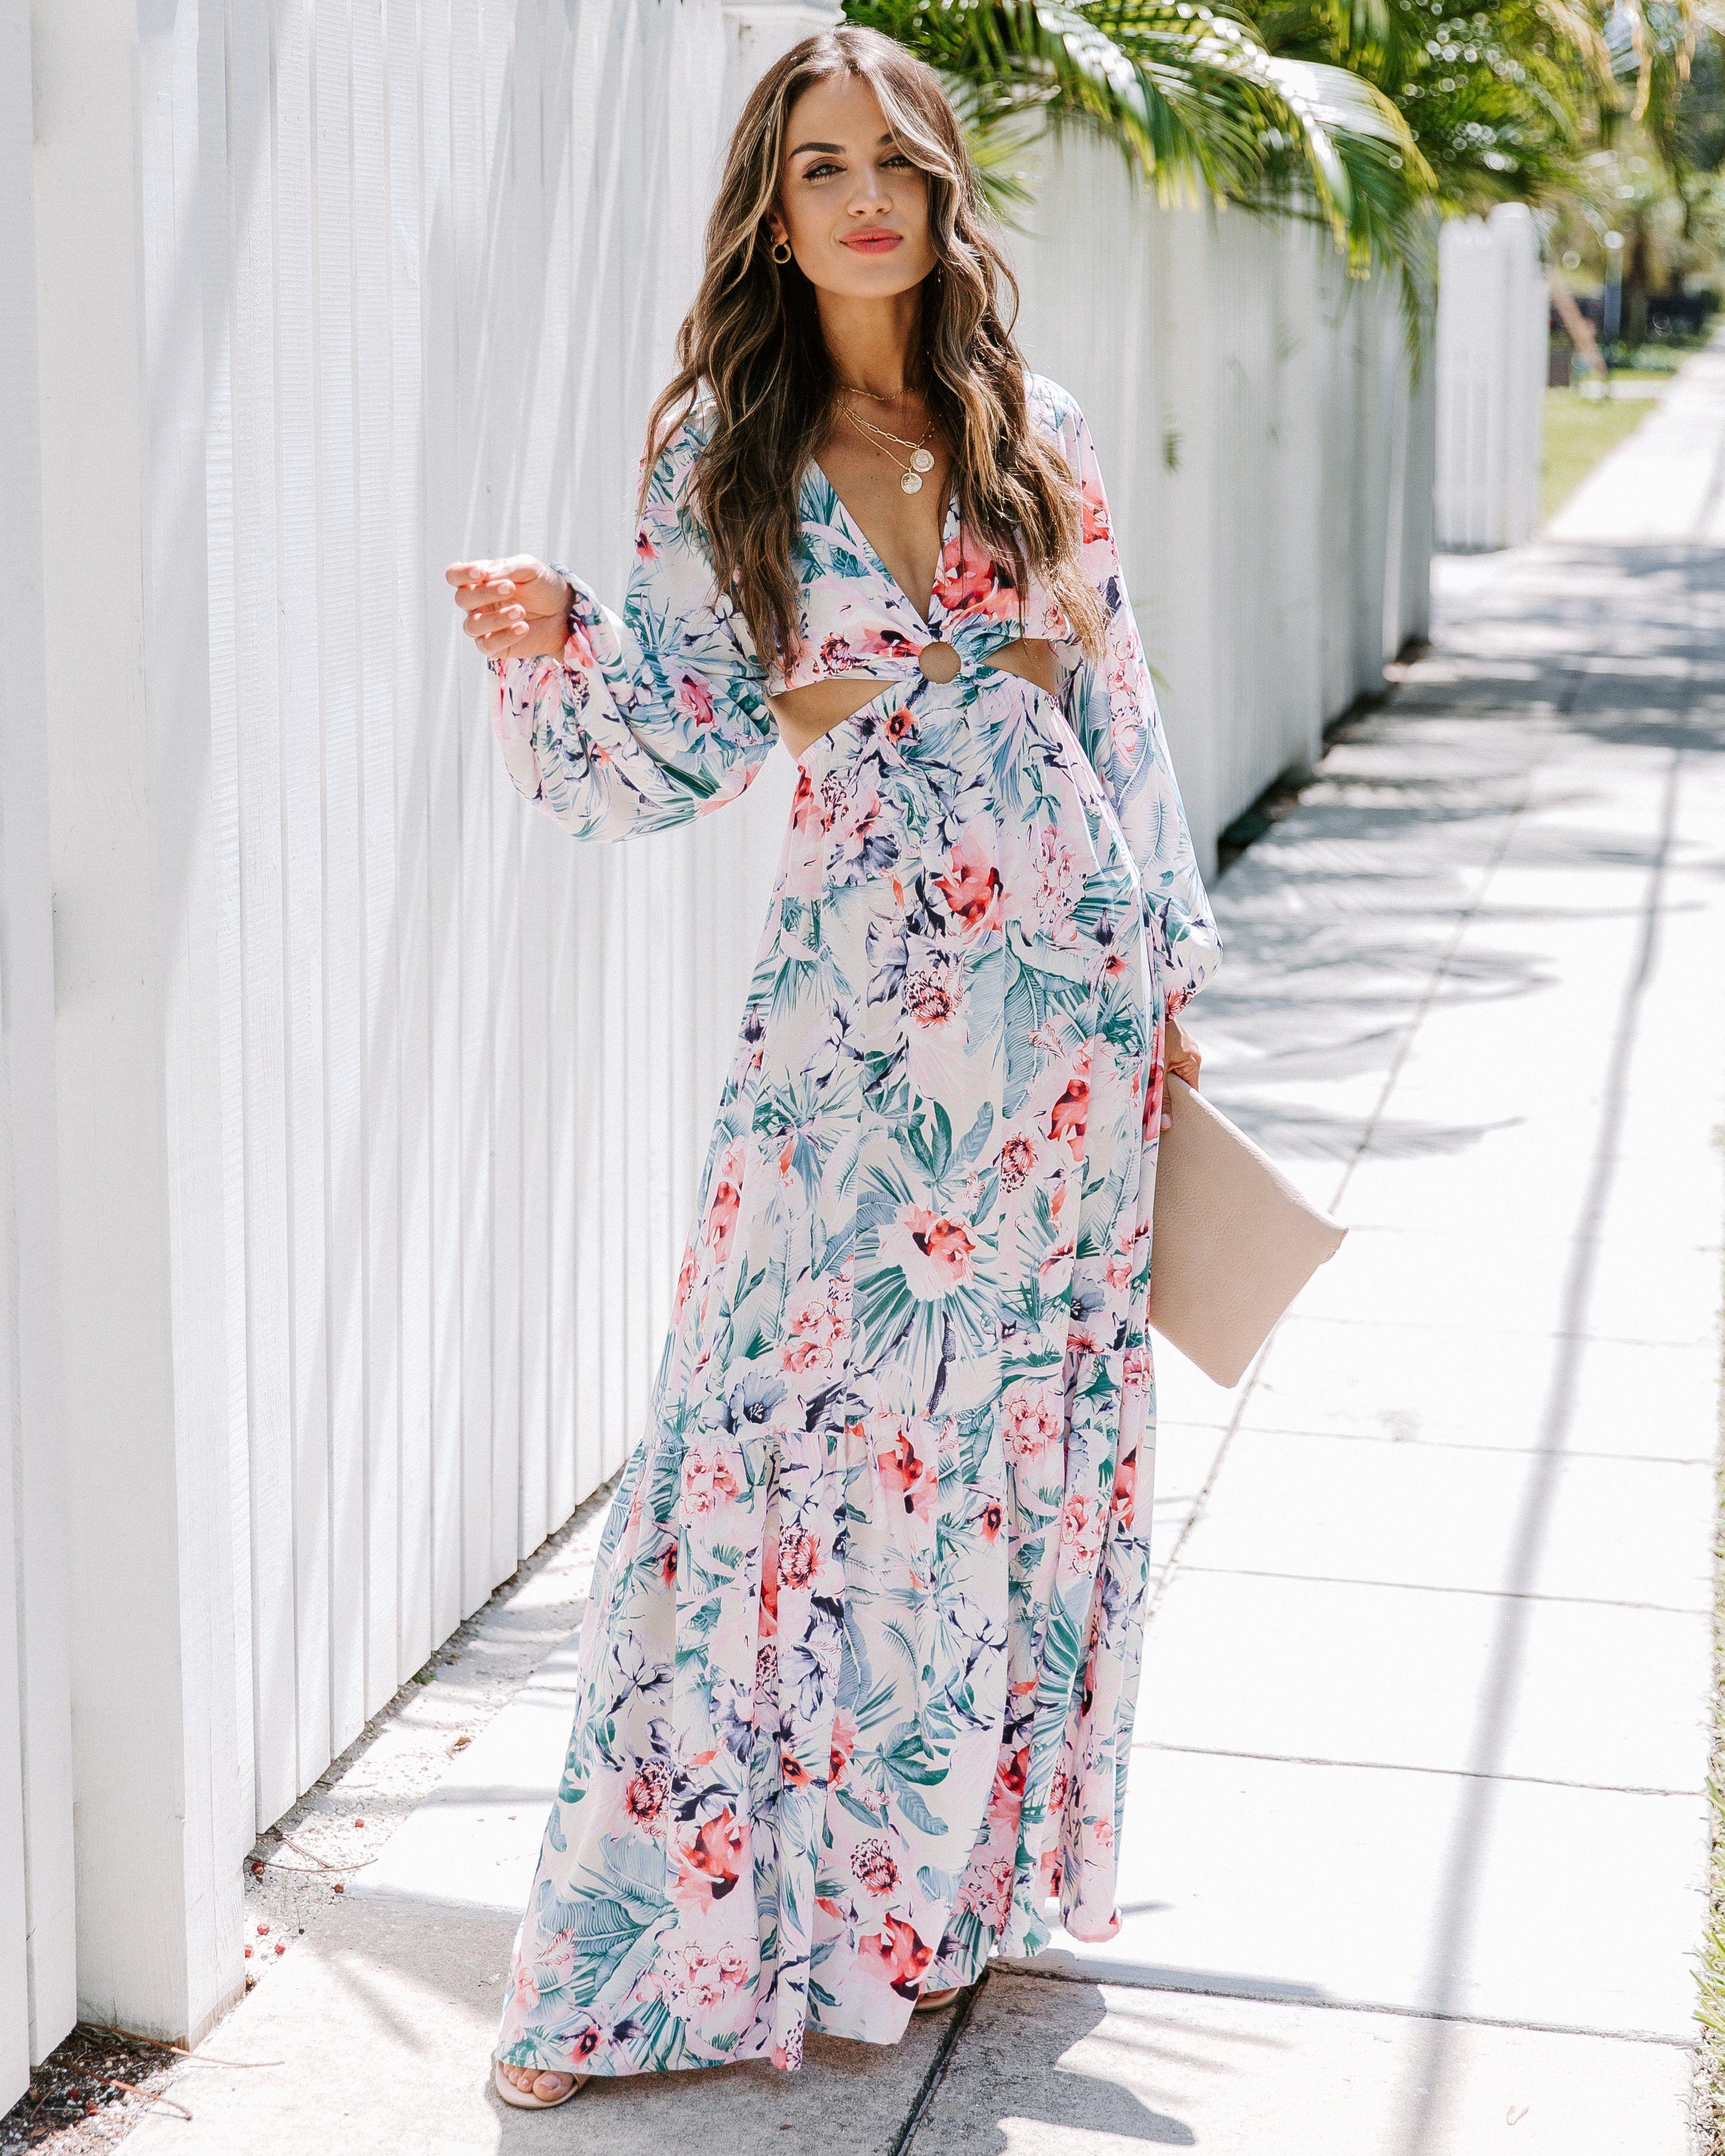 Https Cdn Shopify Com S Files 1 0204 7208 Products 186a4657 51acacd1 998e 4989 B7be 164f21e451e4 Jpg V 1589305678 Cutout Maxi Dress Maxi Dress Dresses [ 4170 x 3336 Pixel ]